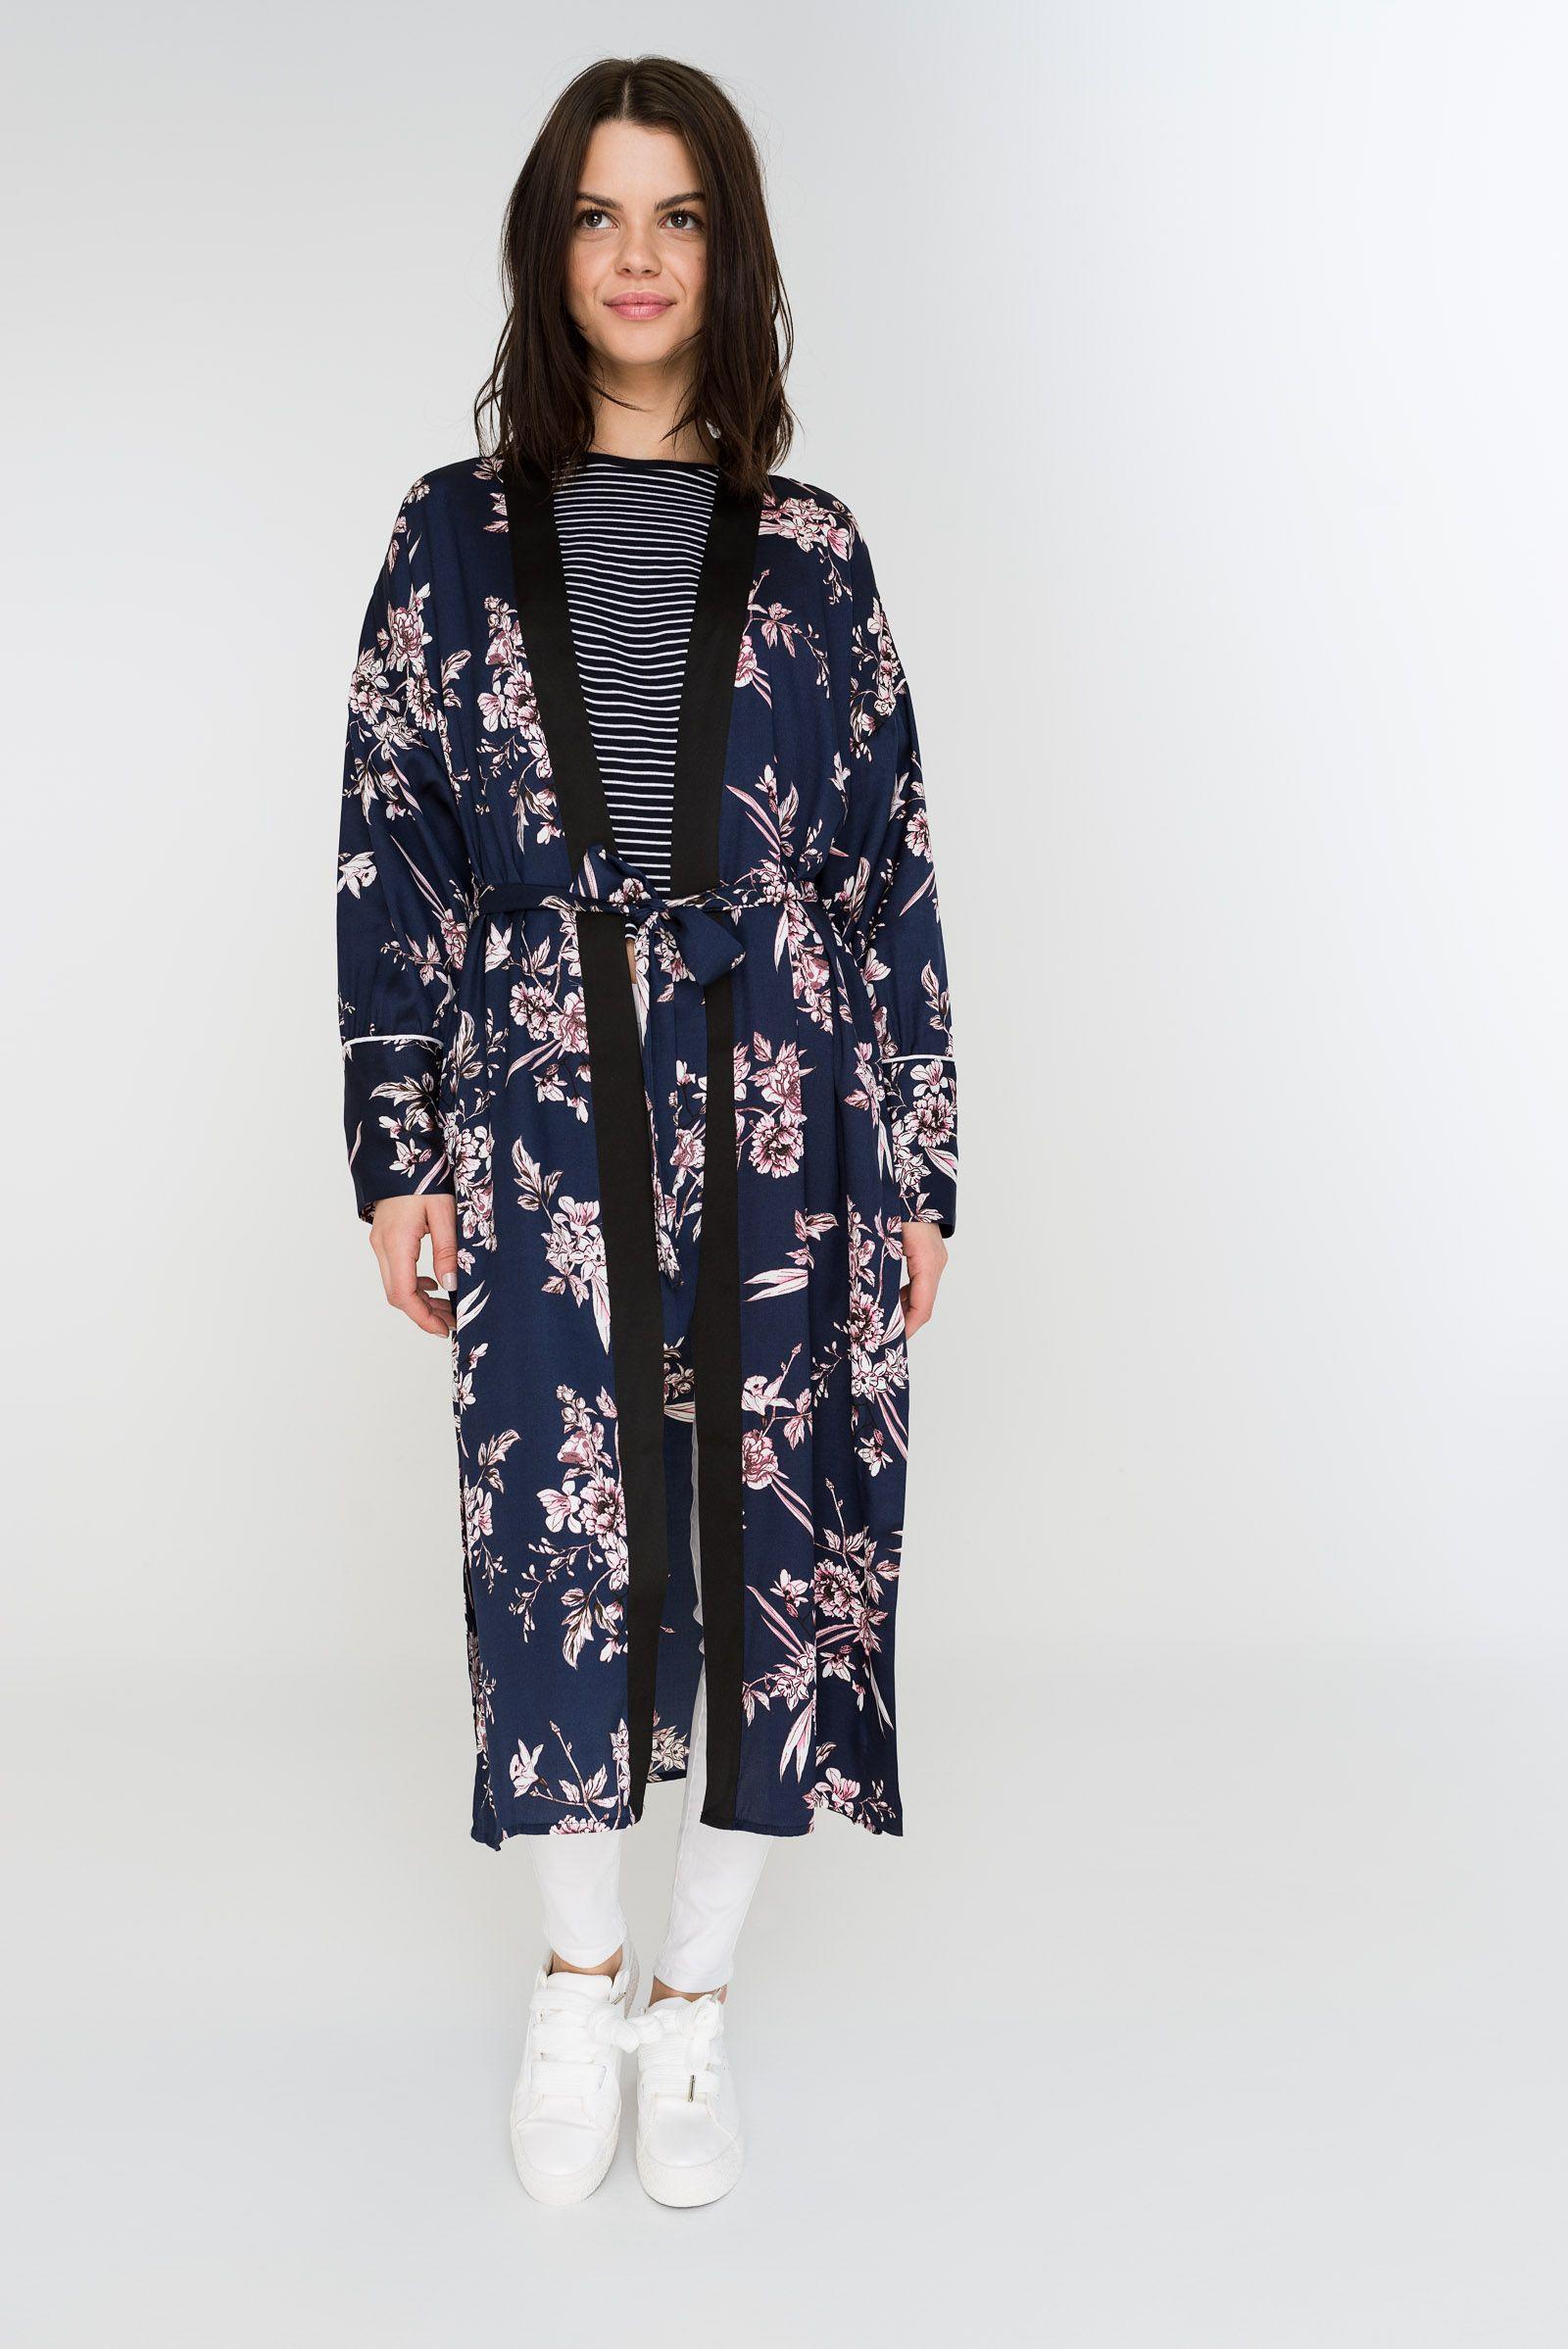 3c876821a Long sleeve kimono. Waist tie strap. 100% polyester. Model is wearing size